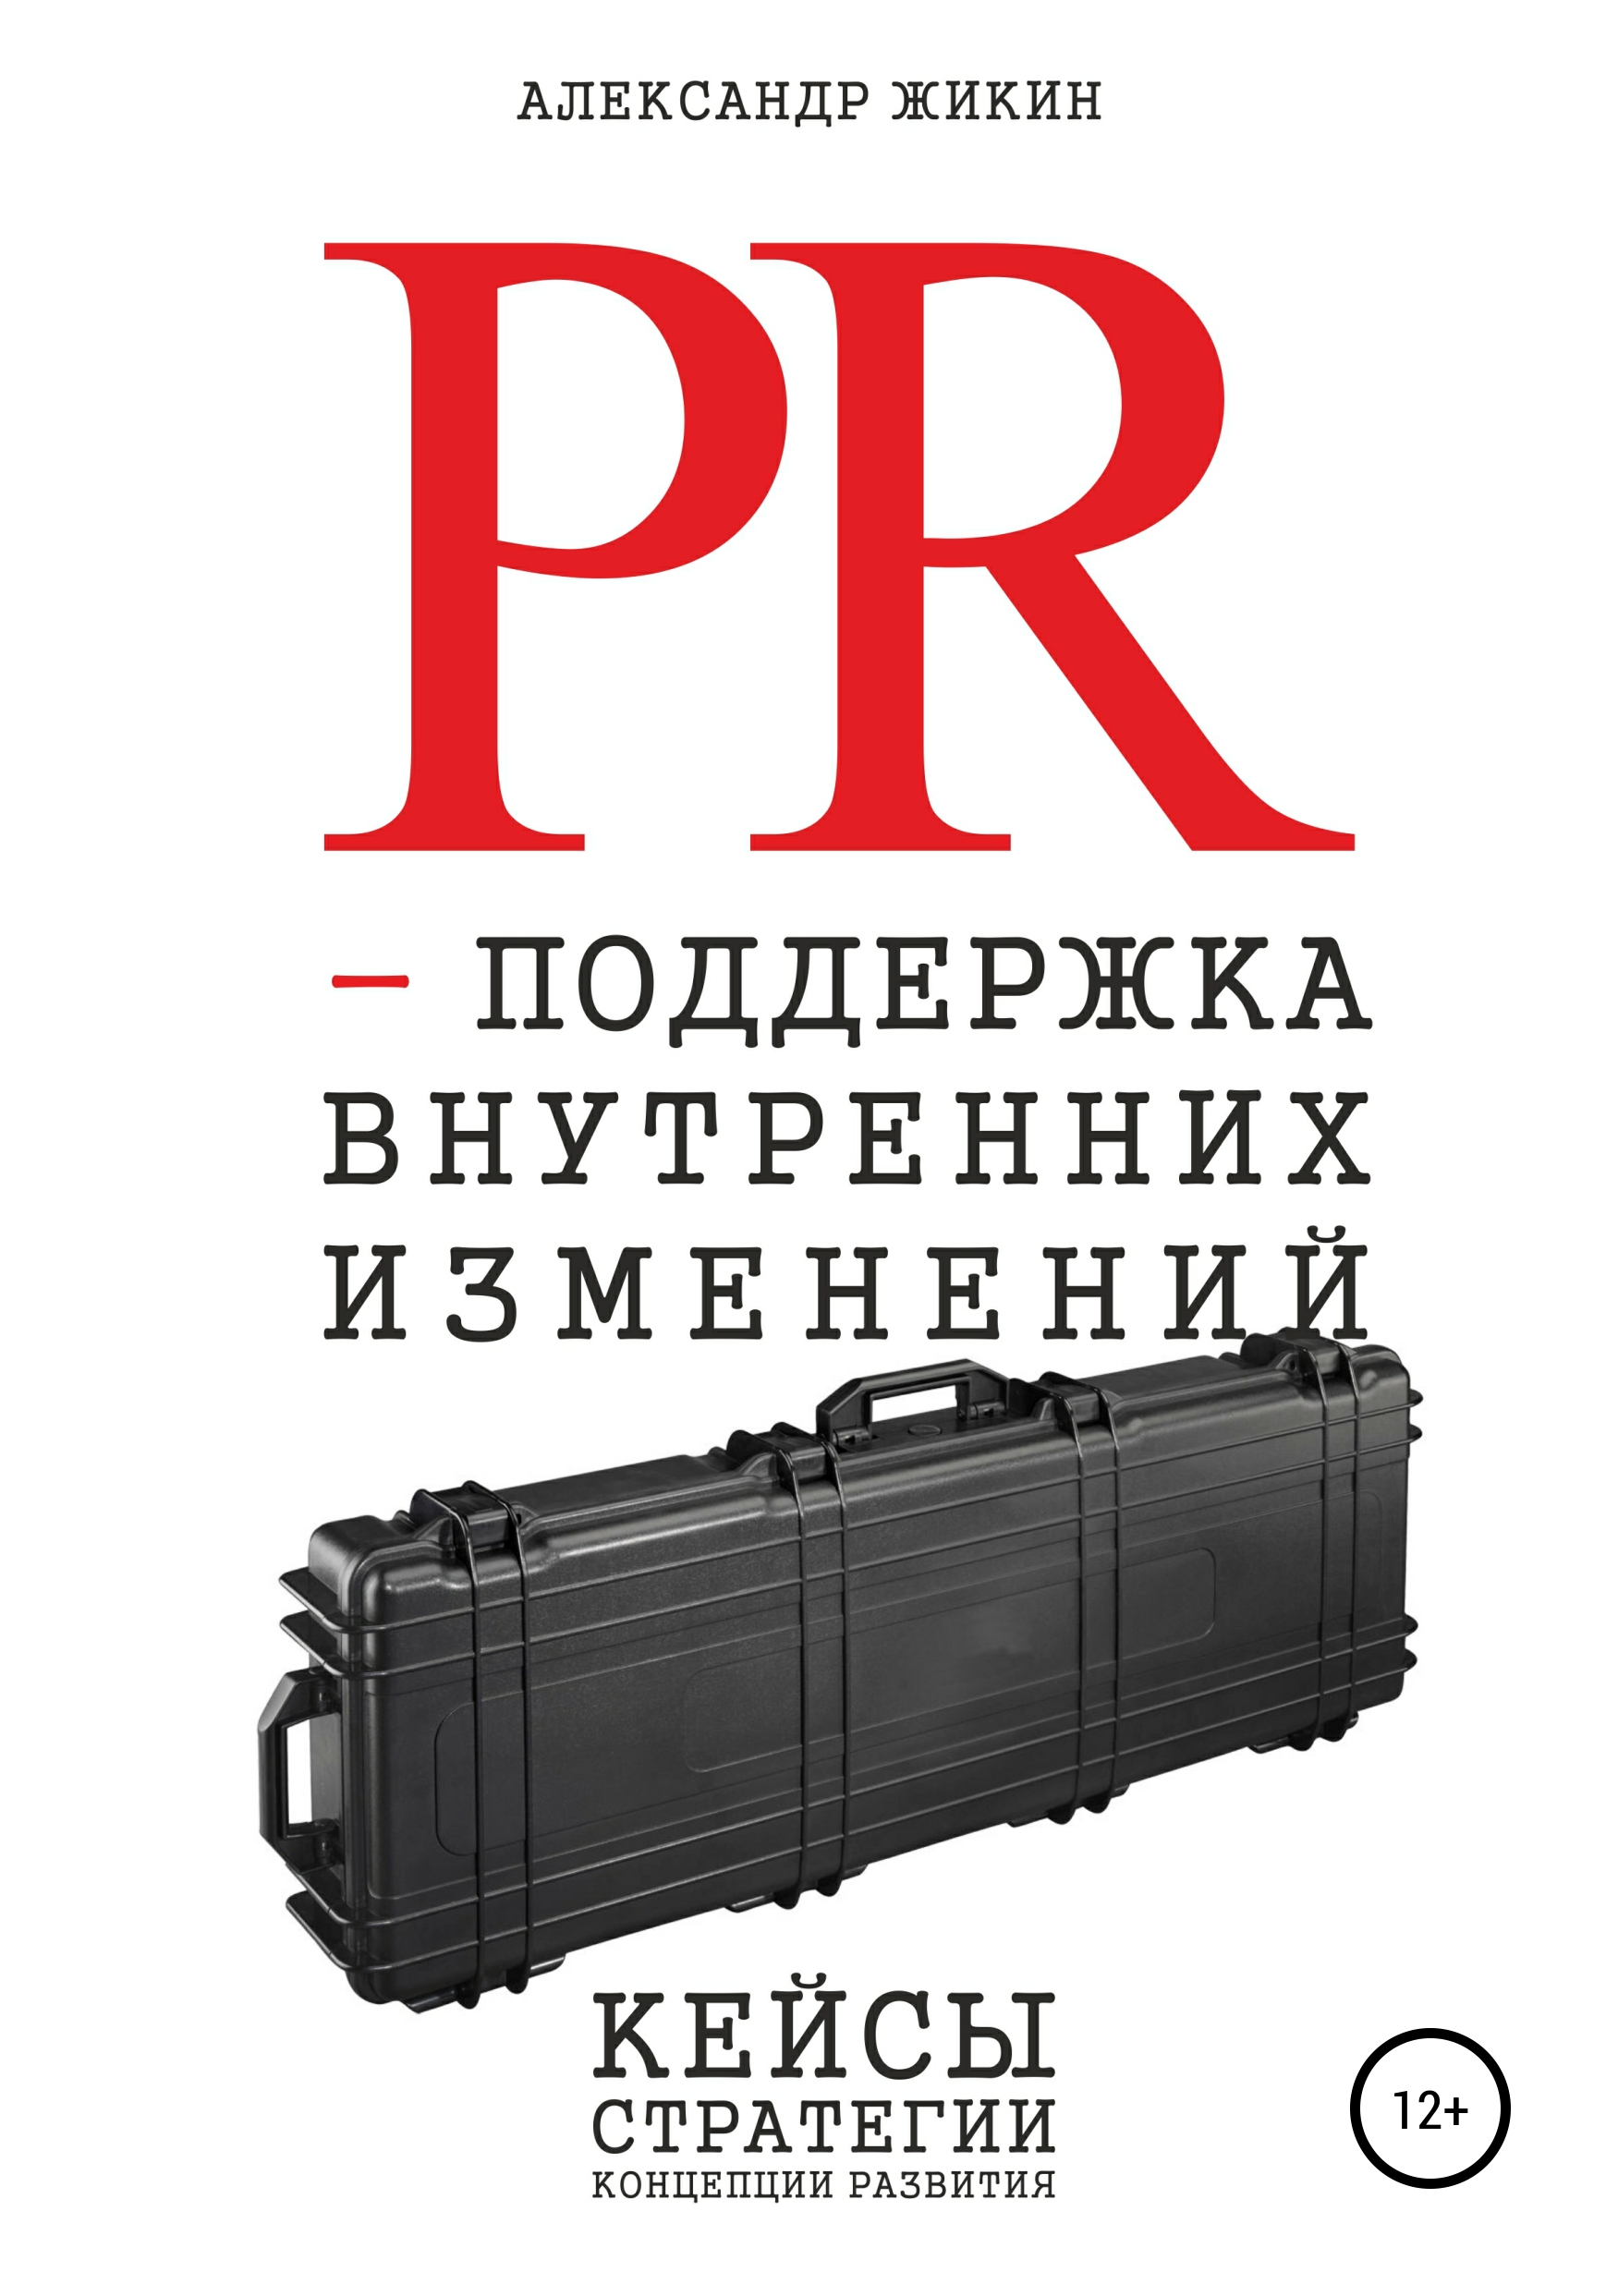 Обложка книги. Автор - Александр Жикин